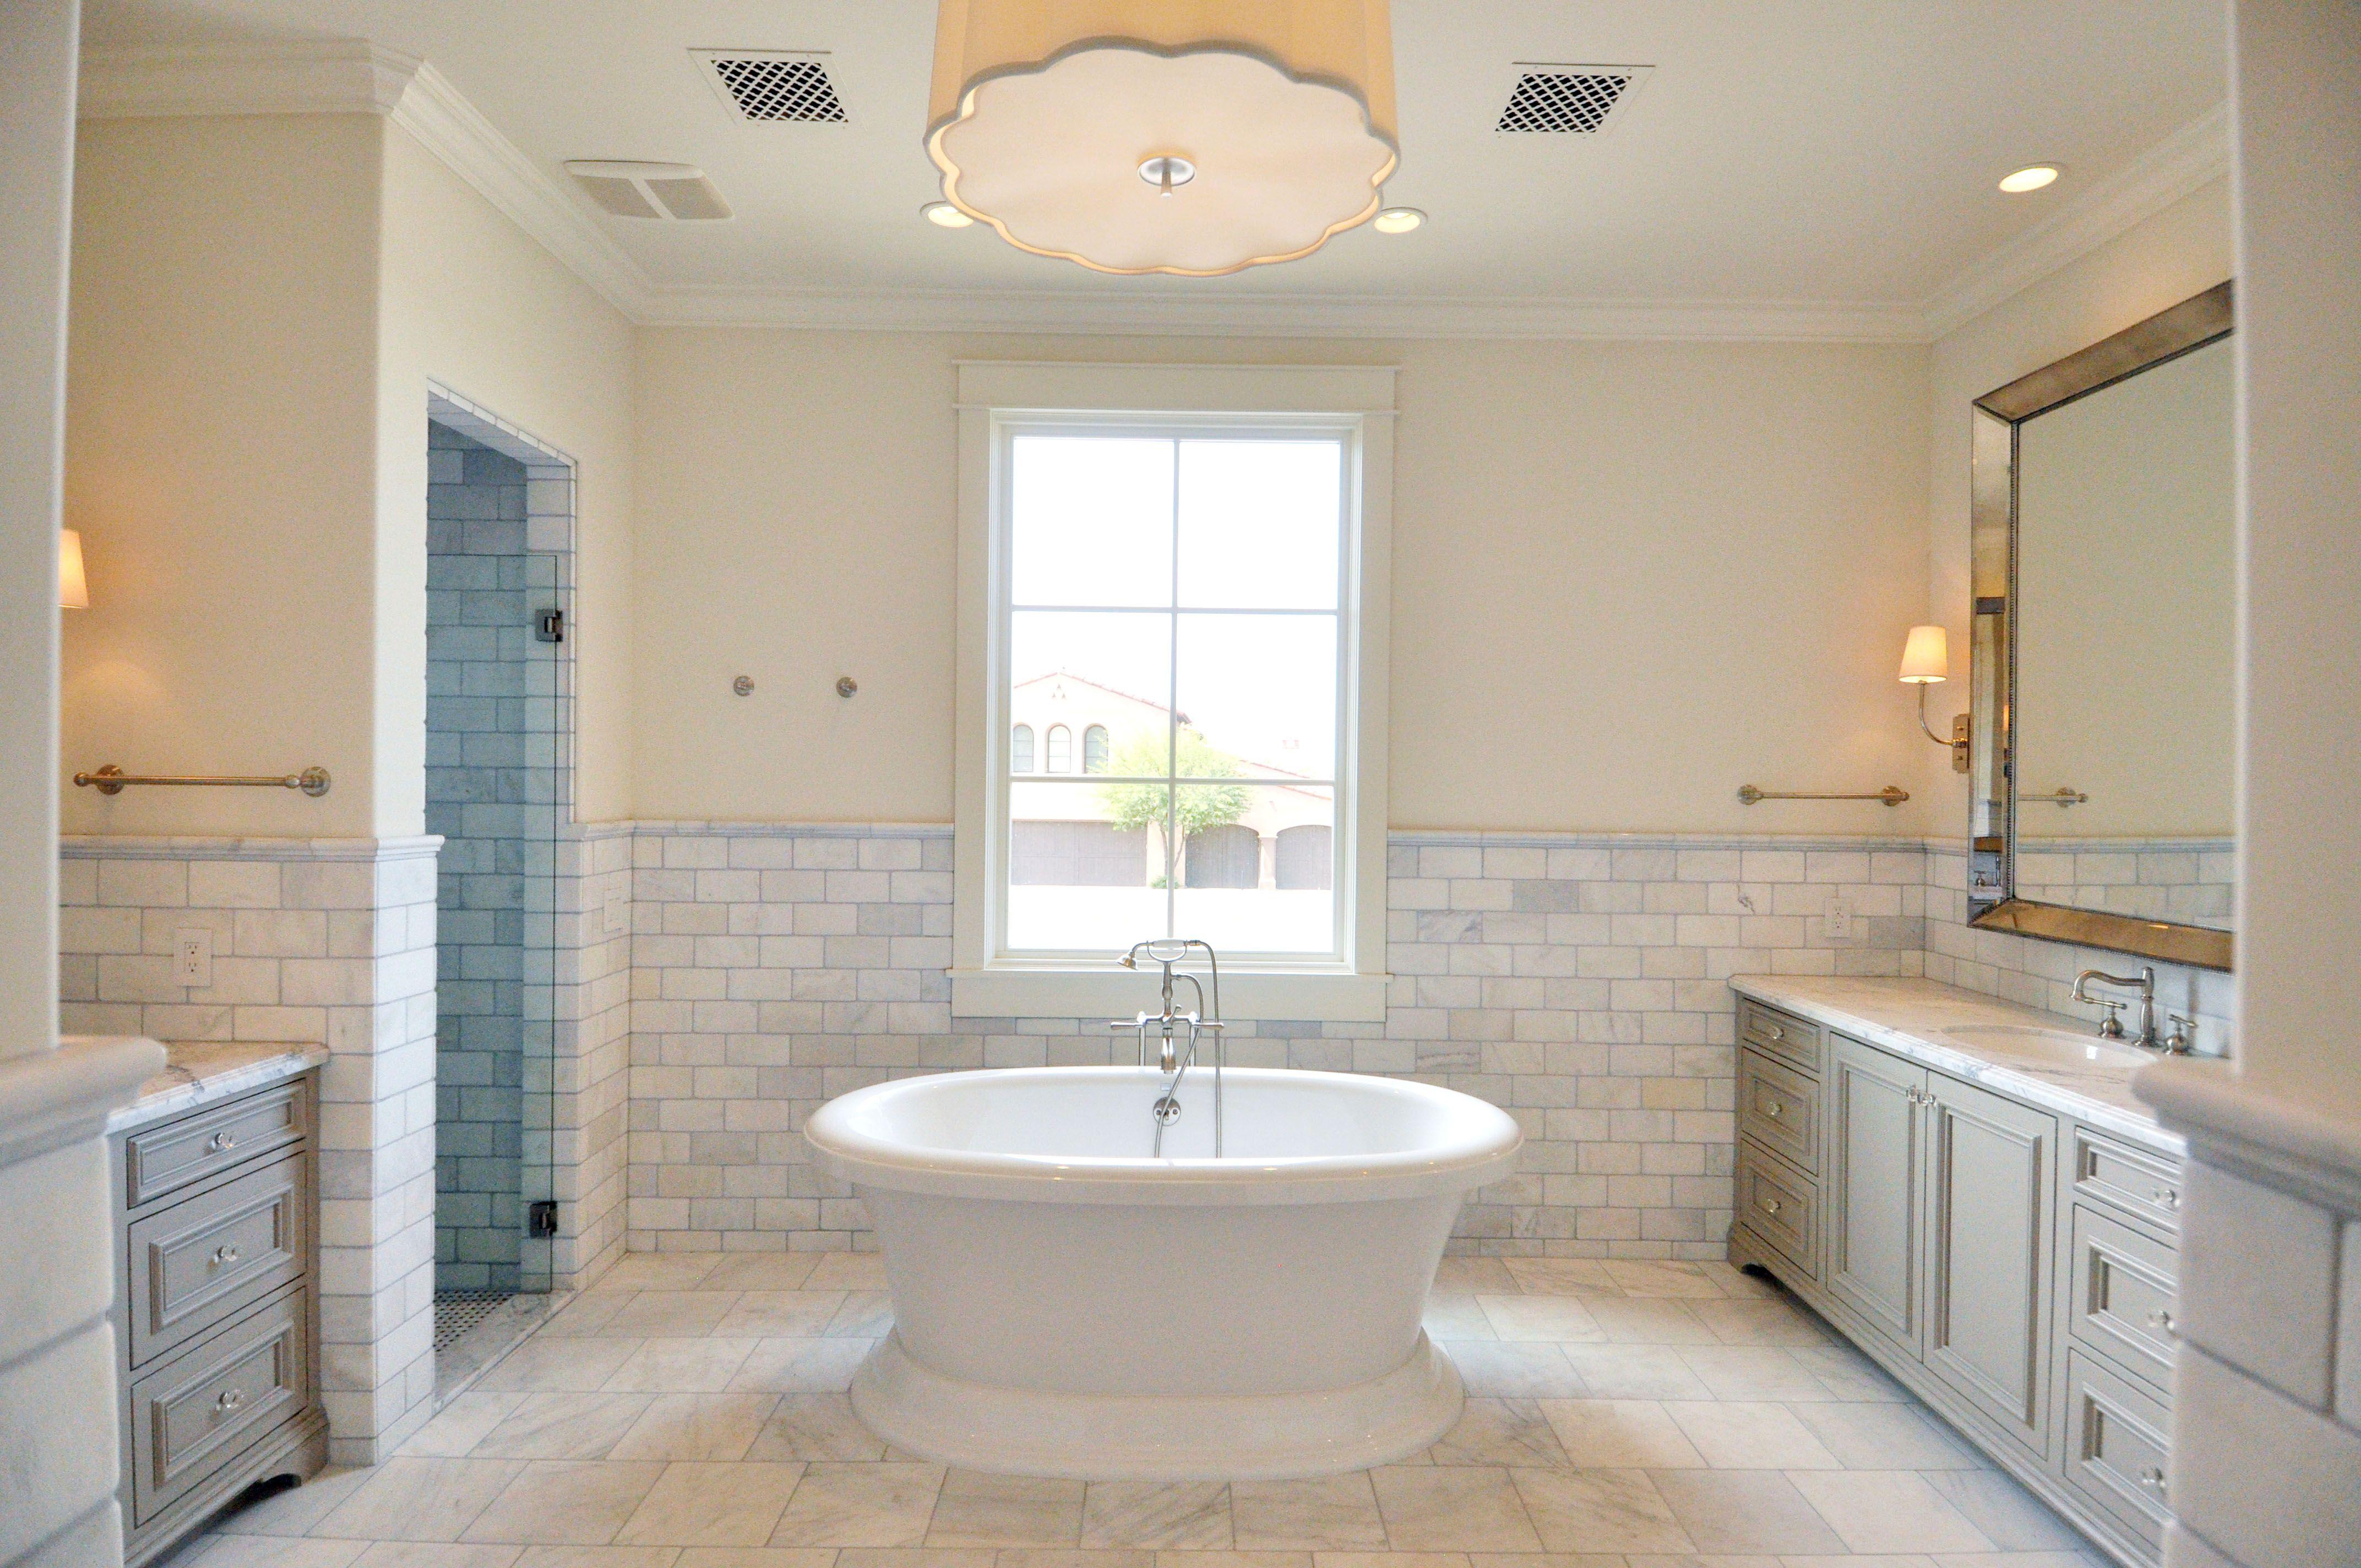 Custom Bathroom Vanities Penrith polytec - vanity doors in truffle lini matt | modern bathroom